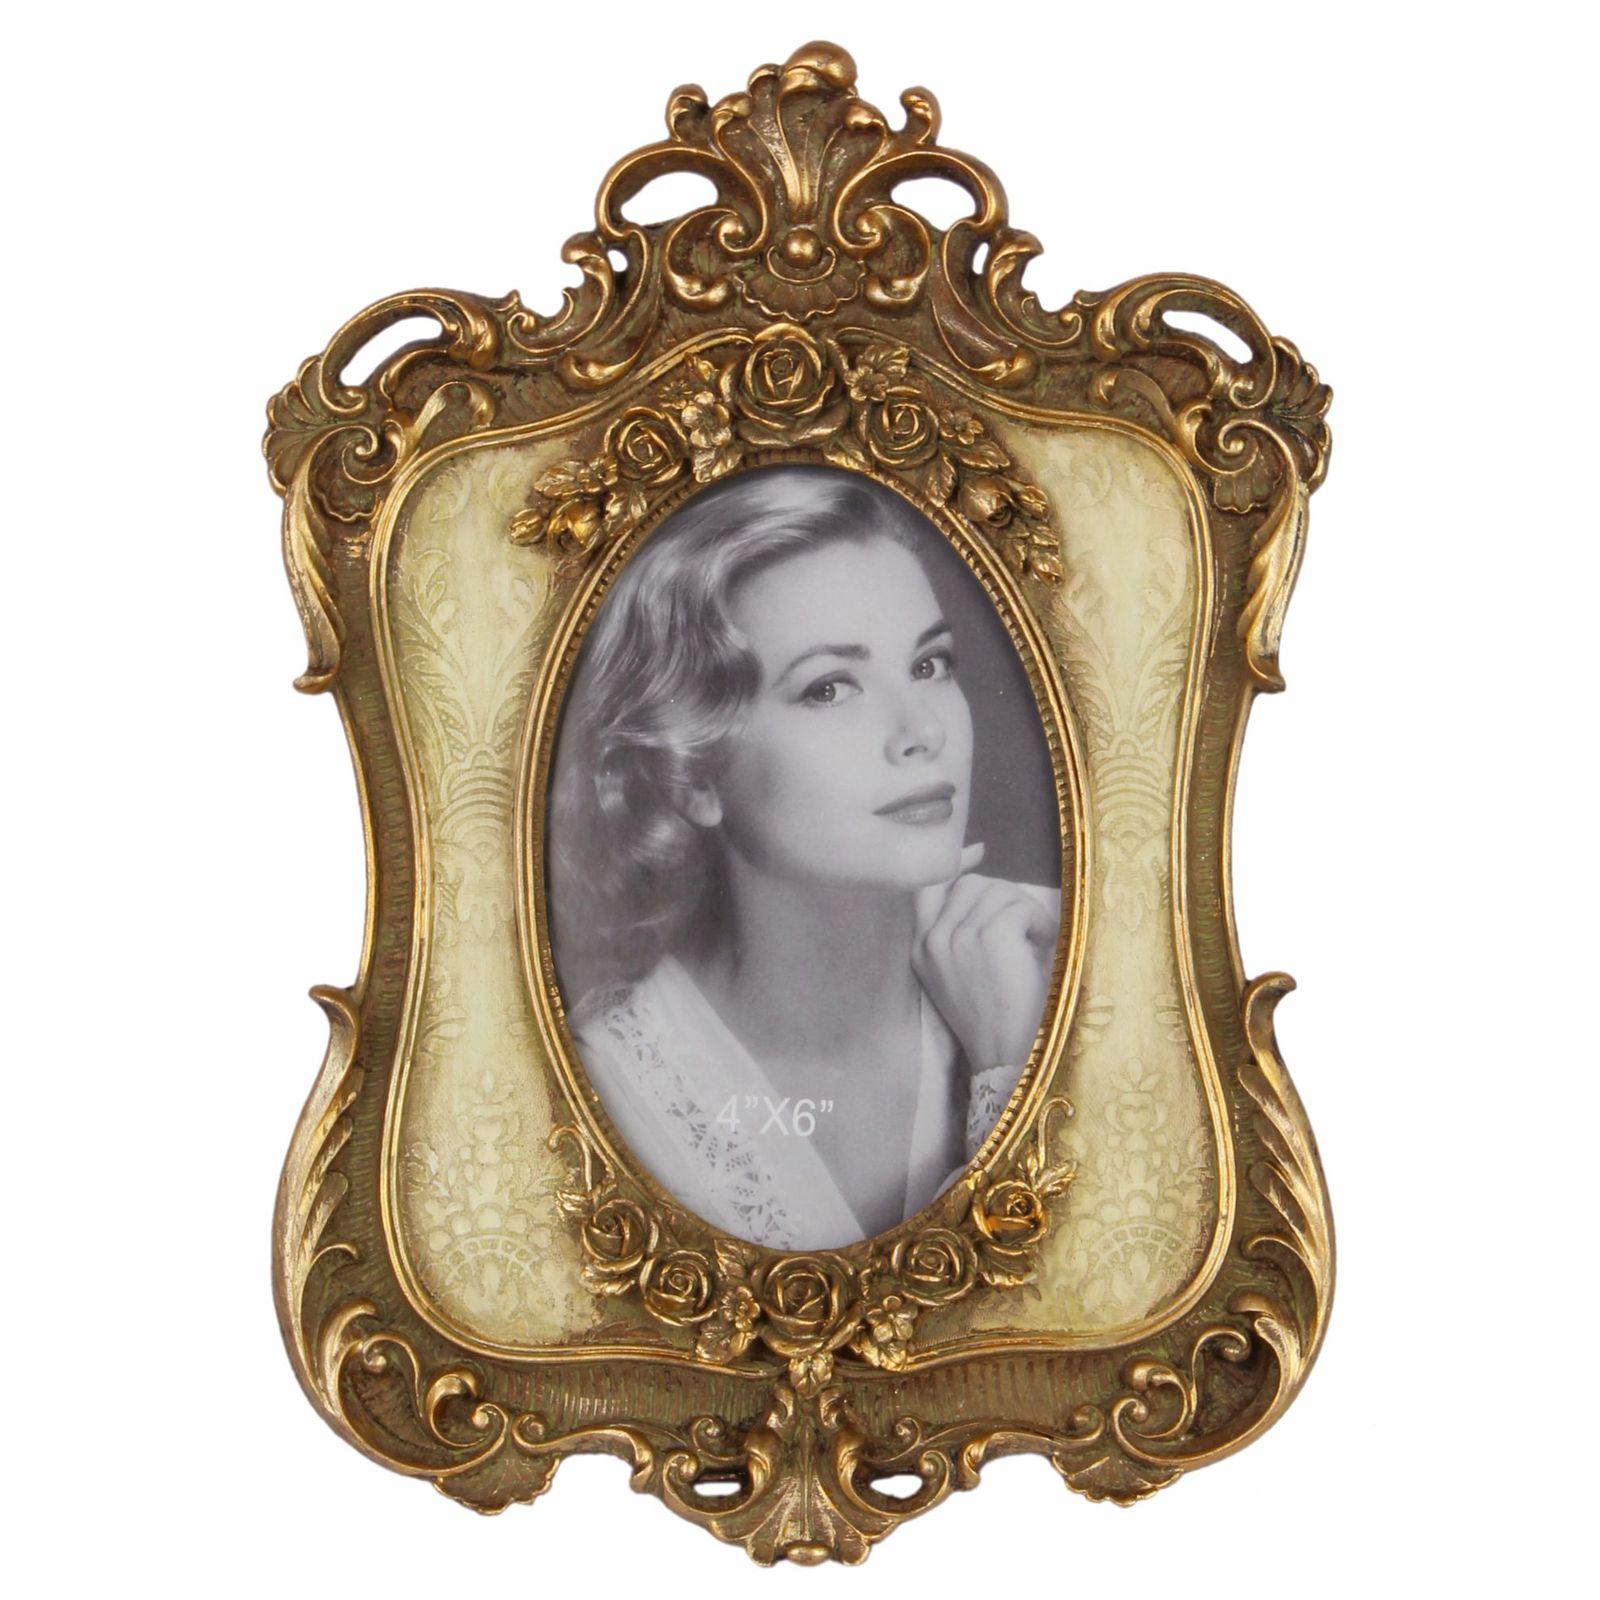 Bilderrahmen antik Foto Resin vergoldet floral Verzierung ...